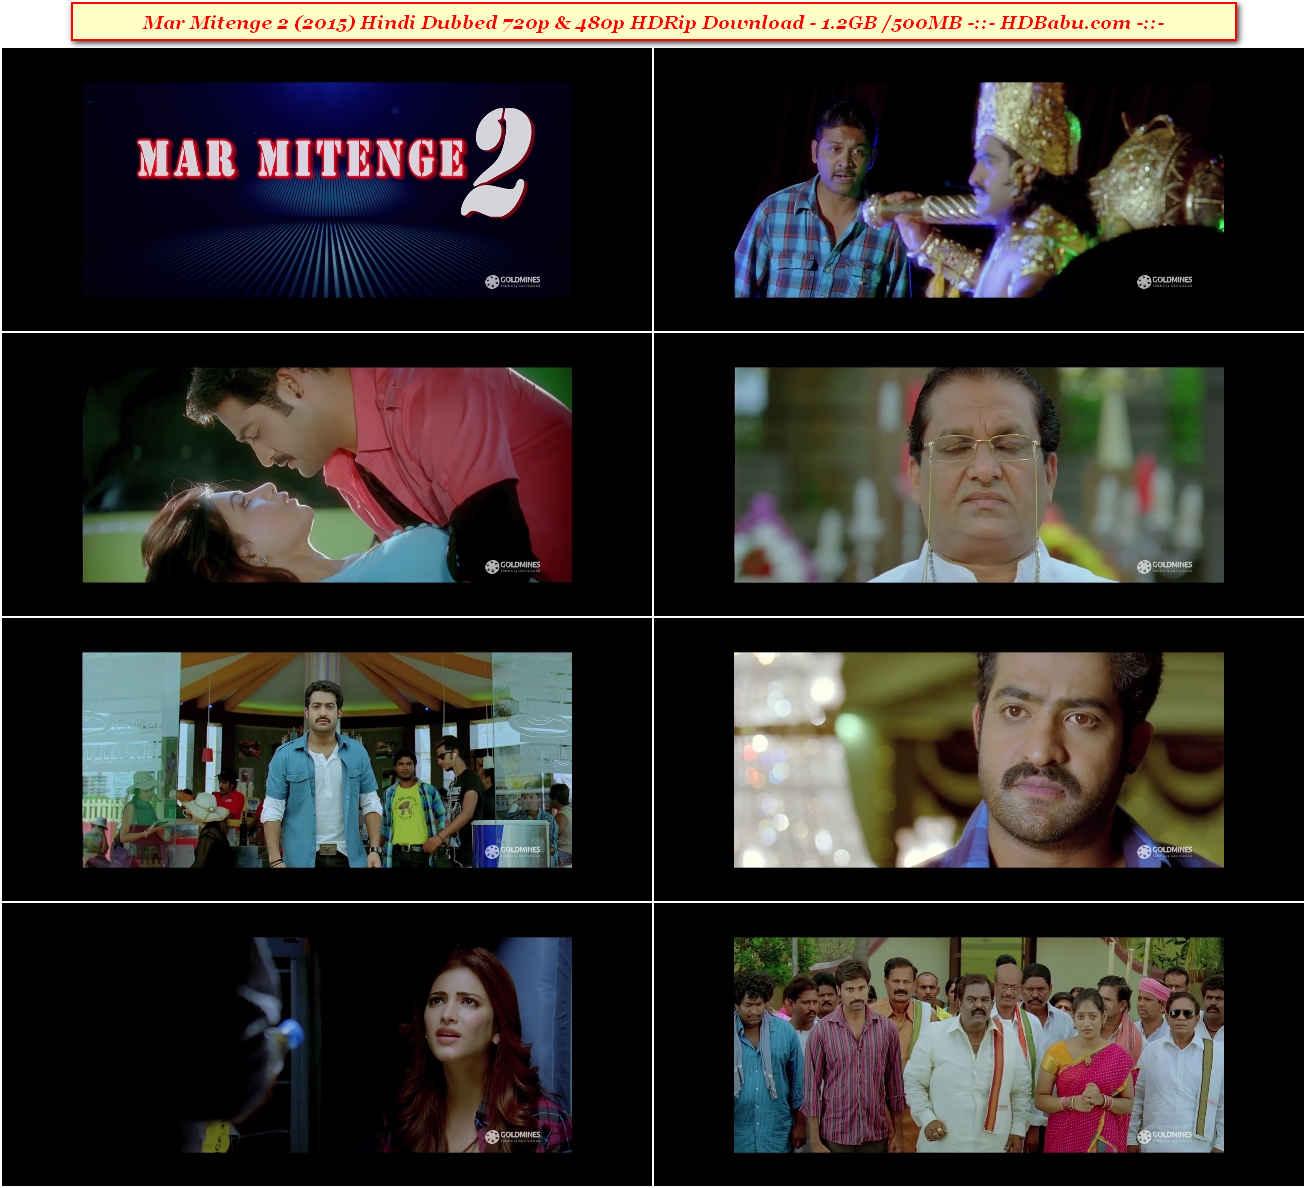 Mar Mitenge 2 Hindi Dubbed Full Movie Download